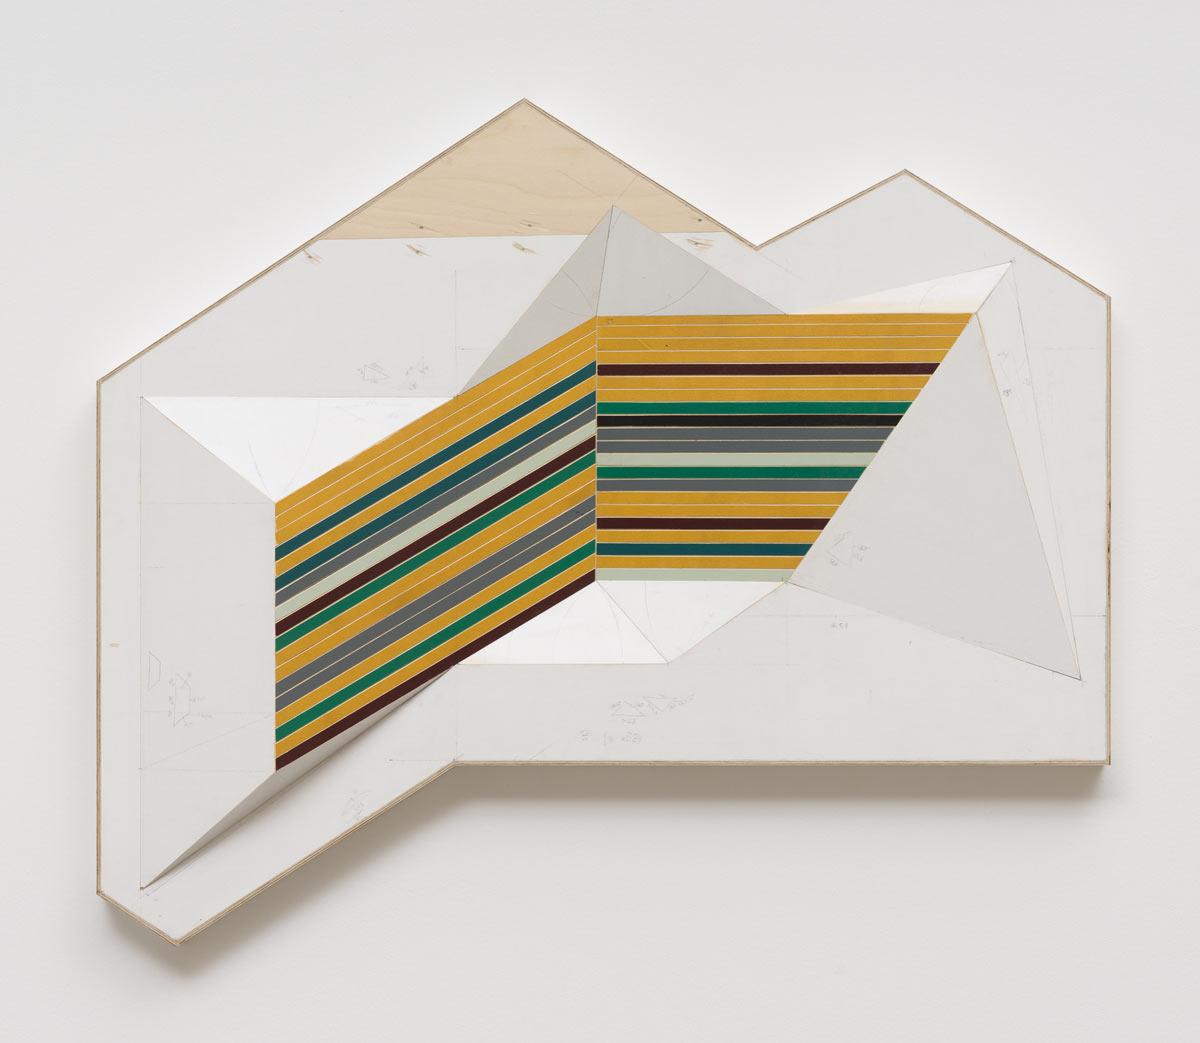 Jay Gard, Selter, 2015, Sperrholz, Schrauben, Leim, Acryl, 2015, Sexauer Gallery